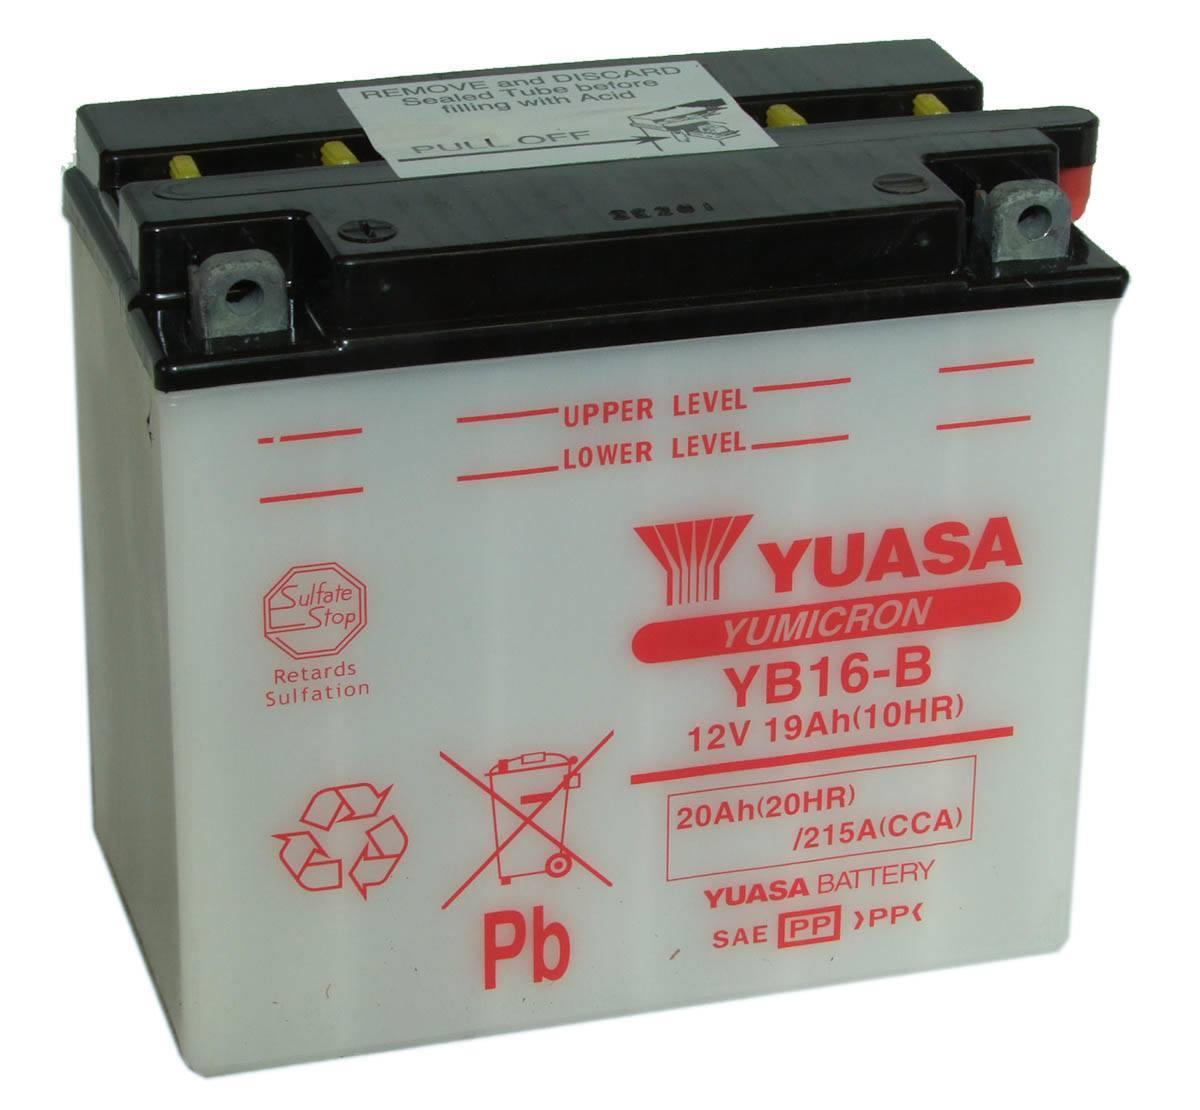 Harley Davidson Battery >> Yuasa Yb16 B 12v Motorcycle Battery